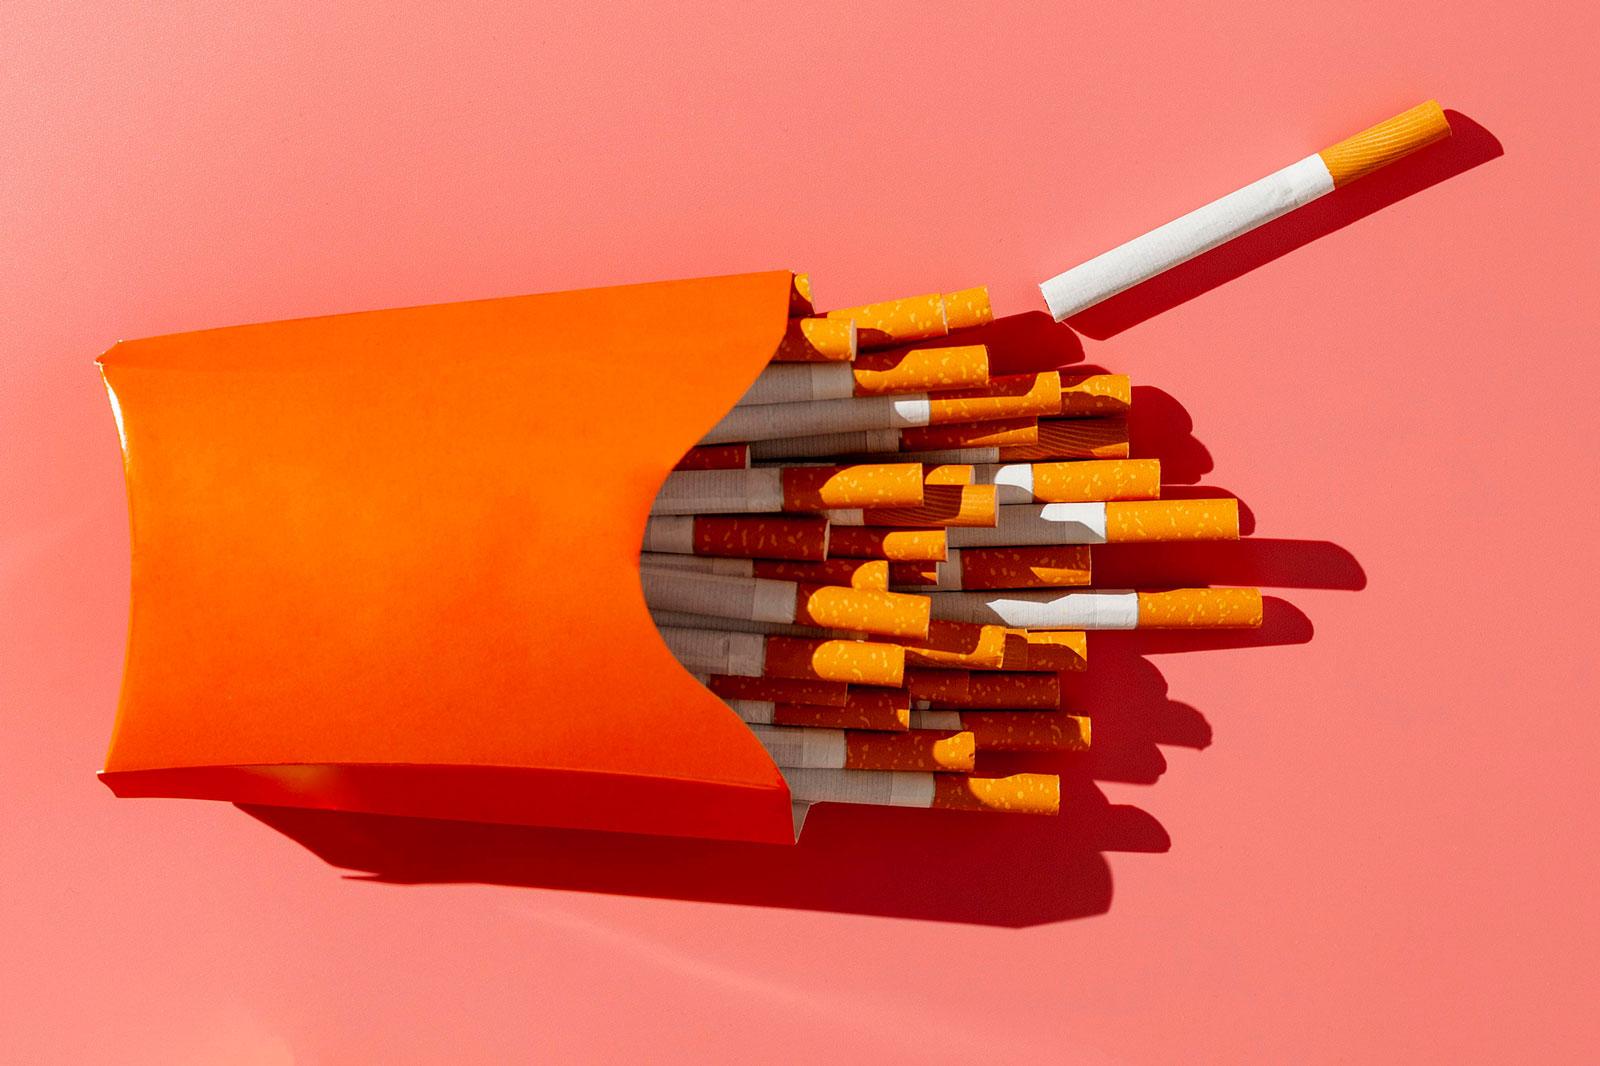 День отказа от курения табака